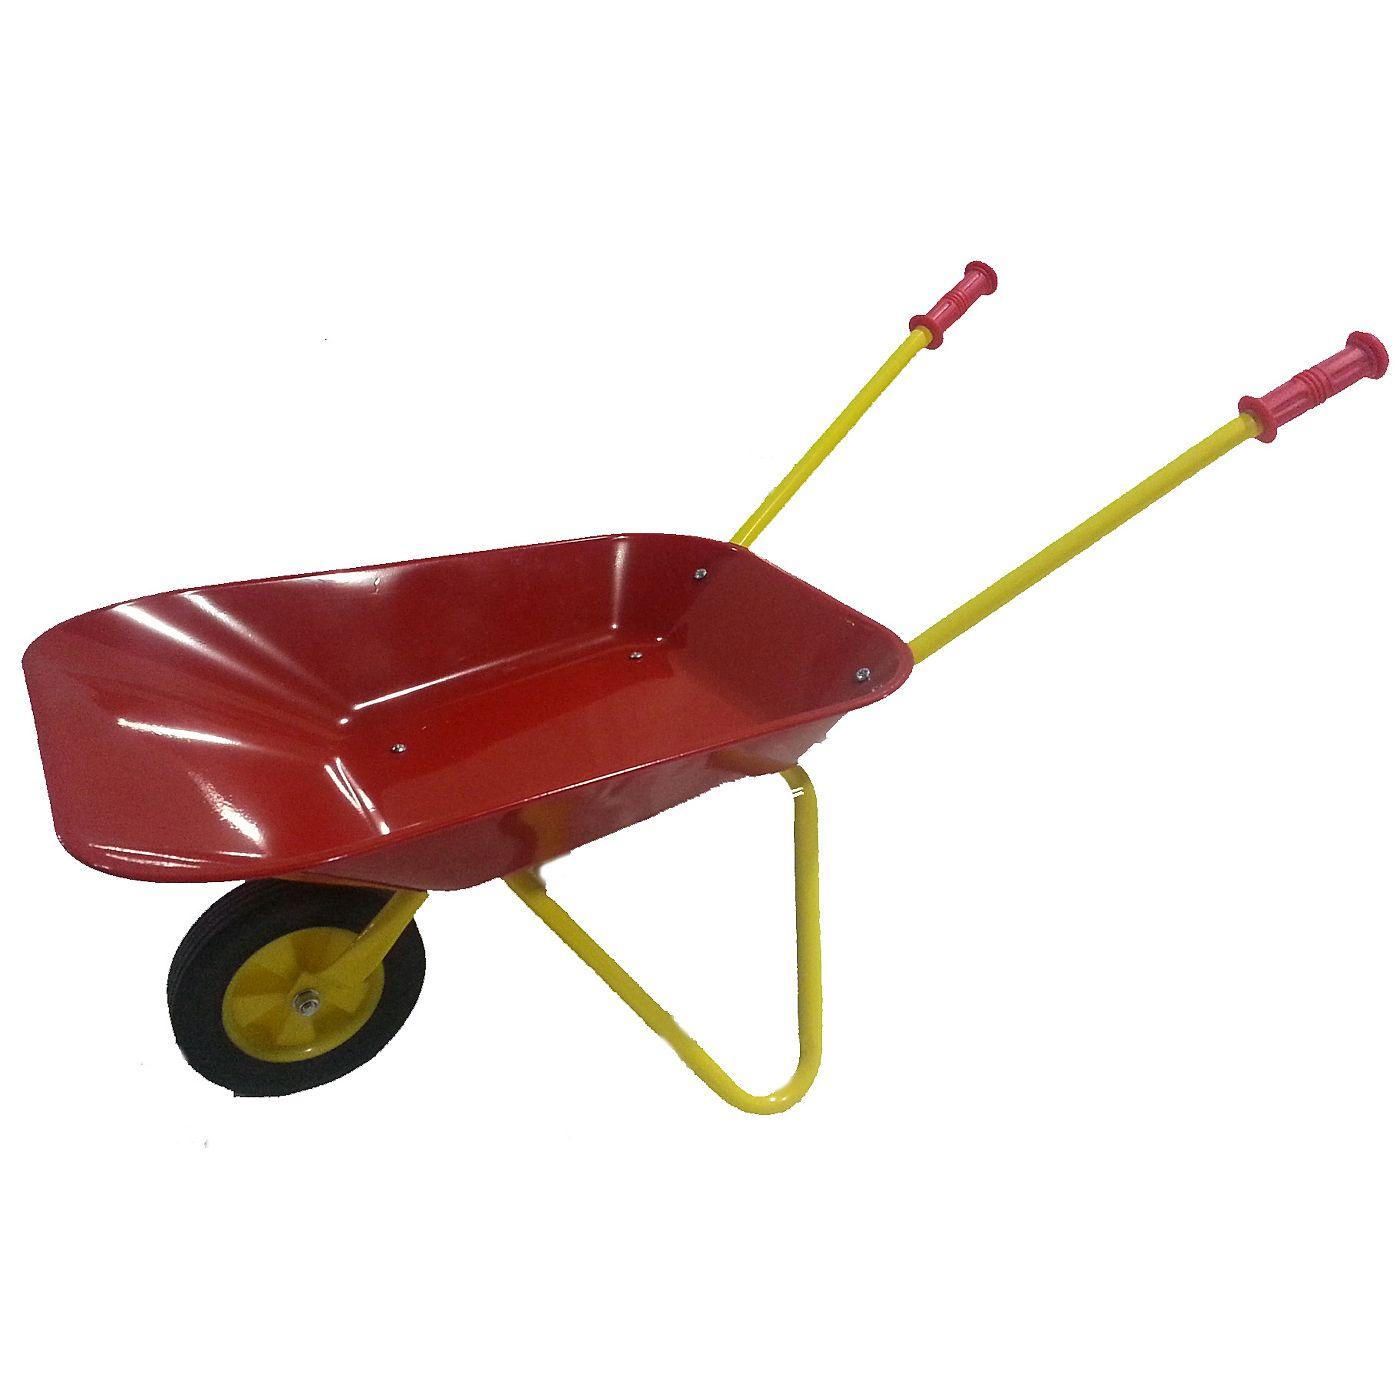 George Home Wheelbarrow Kids Gardening Asda Direct With